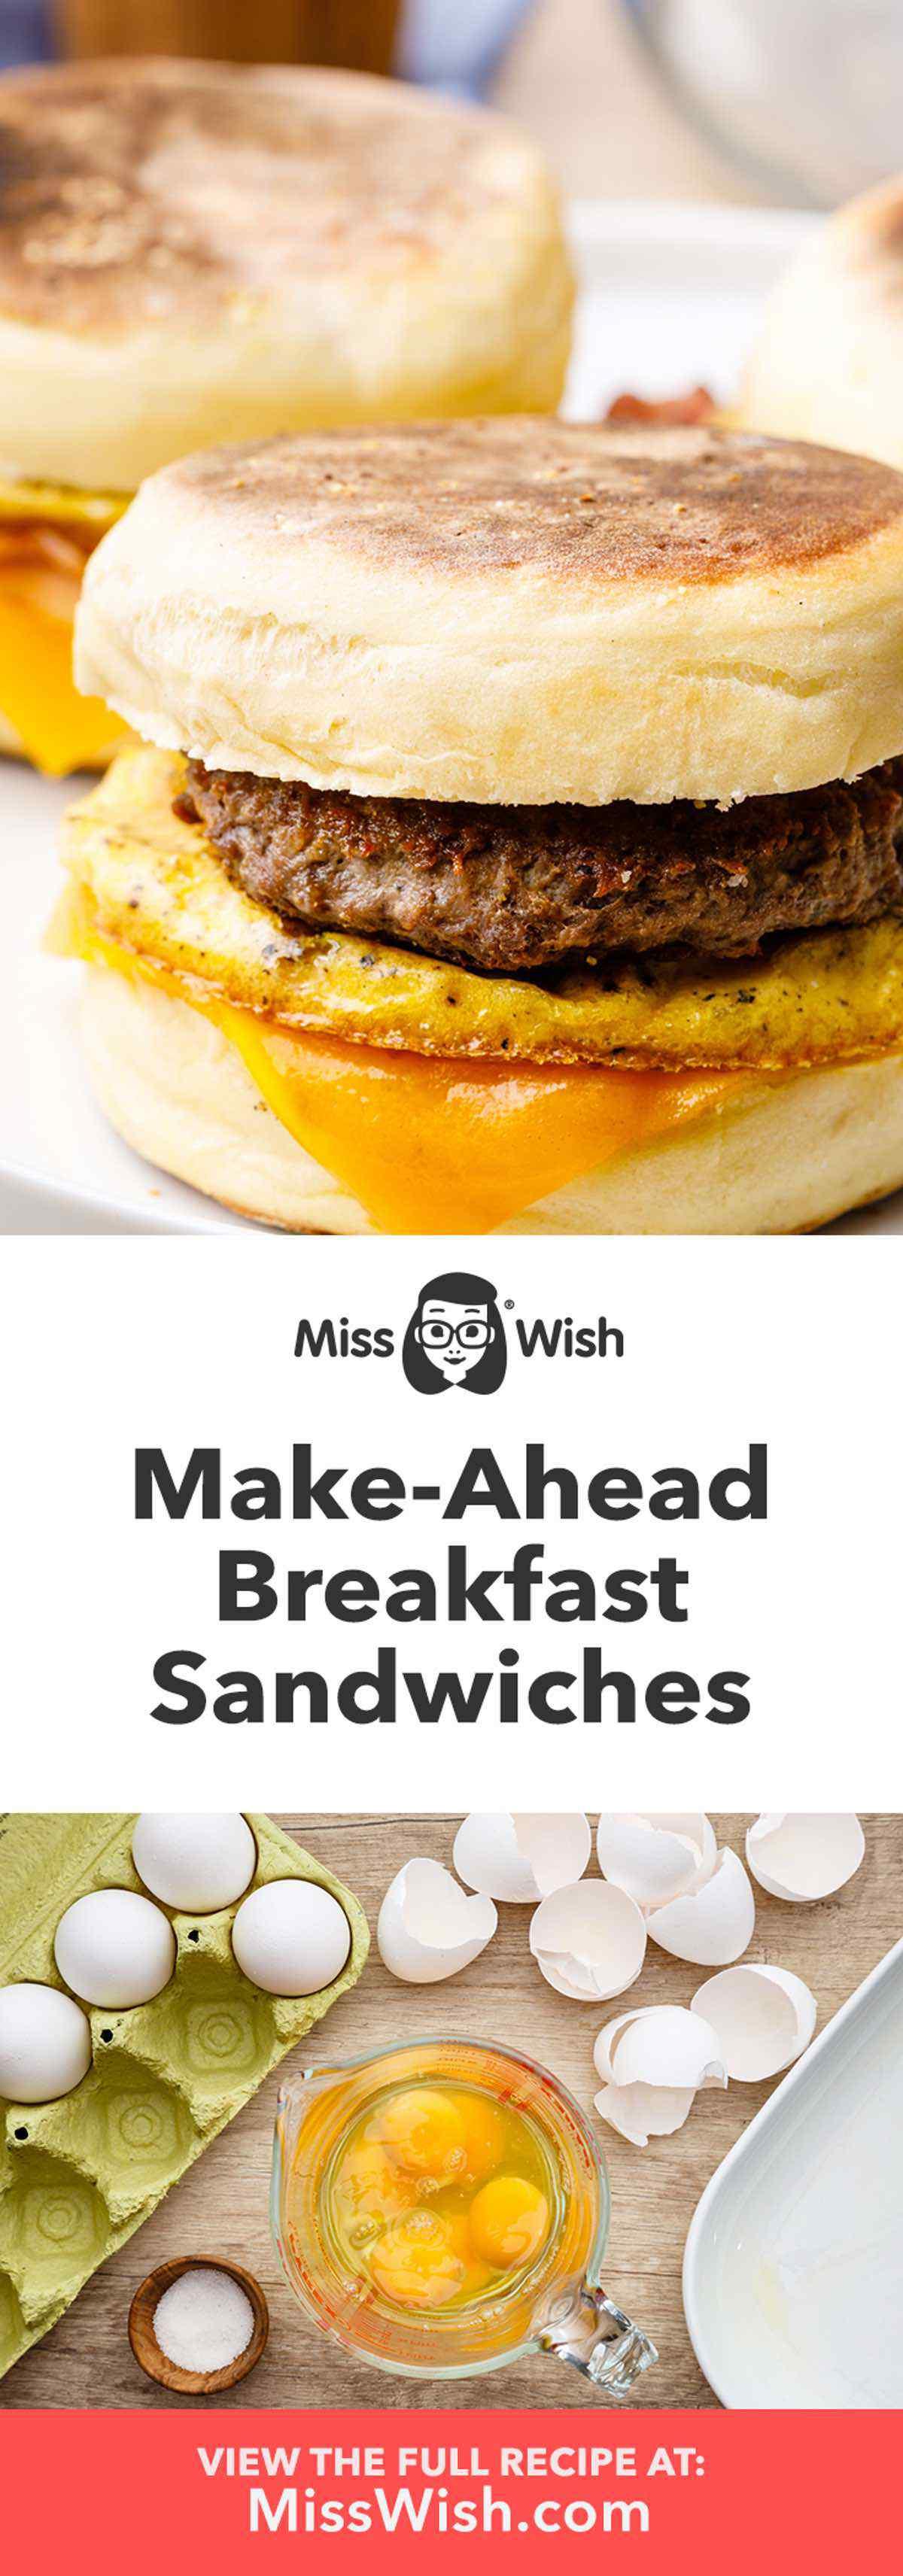 Make-Ahead Breakfast Sandwiches